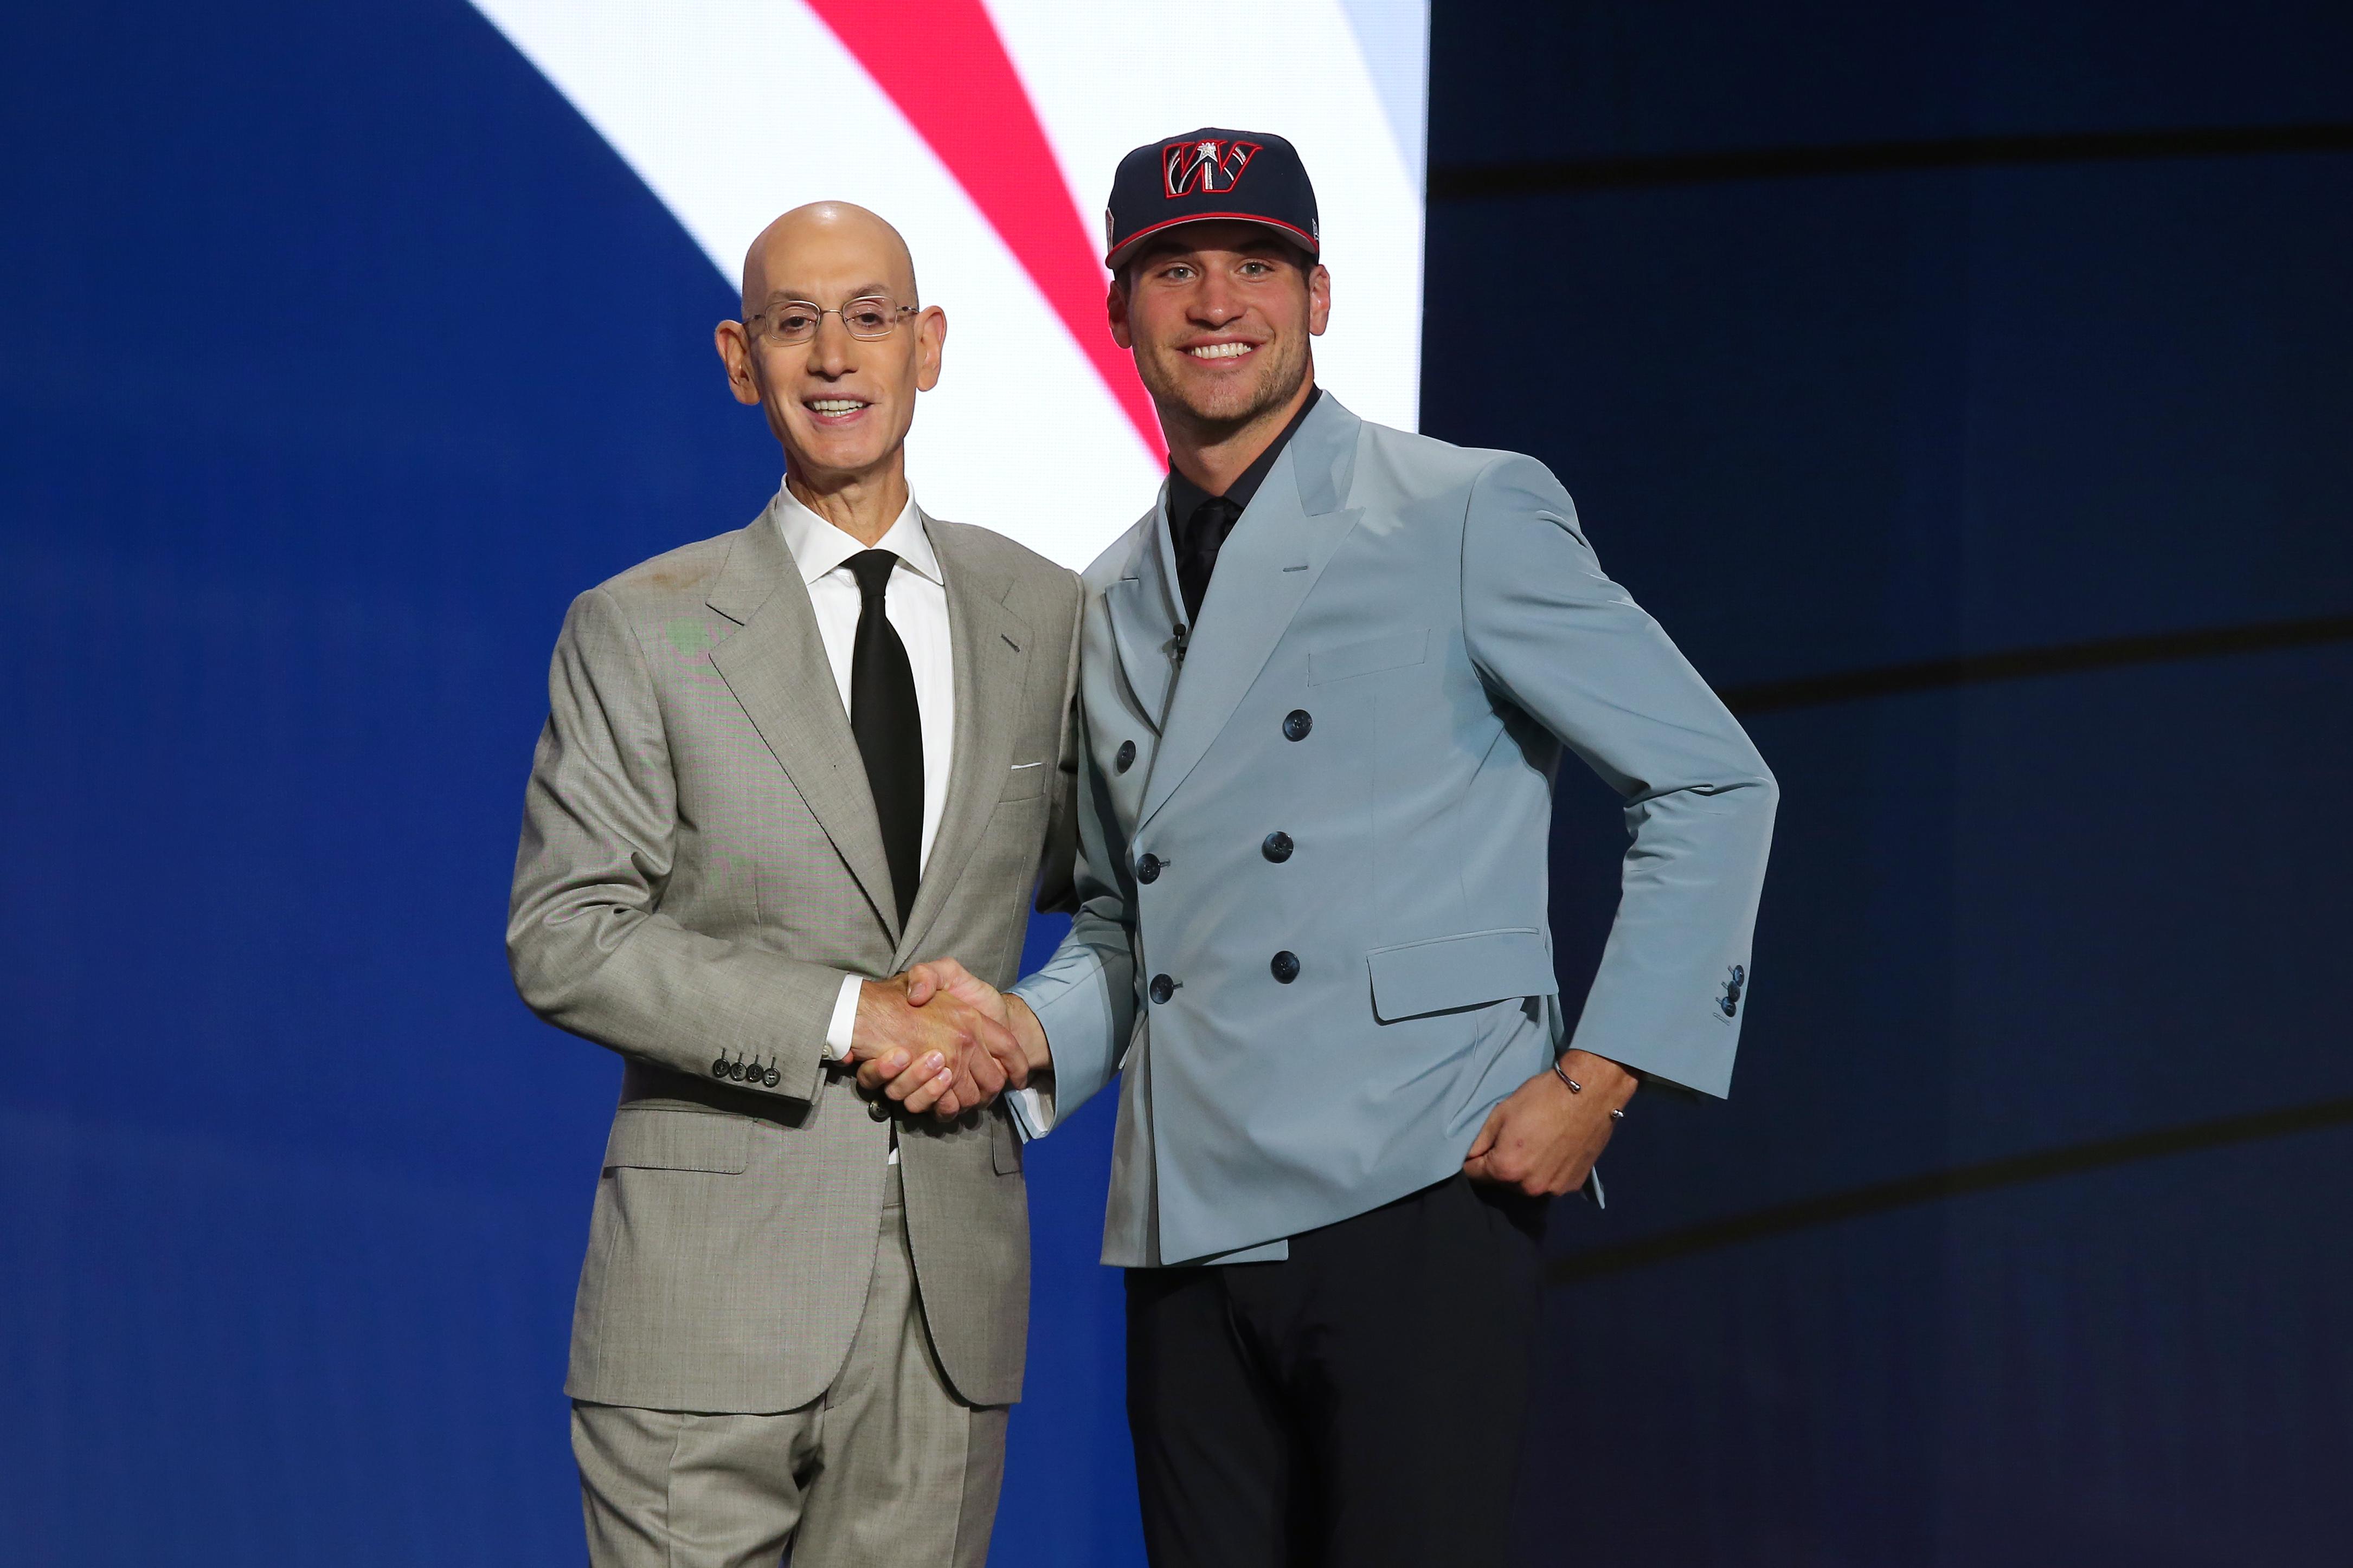 Wizards draft Corey Kispert and Isaiah Todd in 2021 NBA Draft